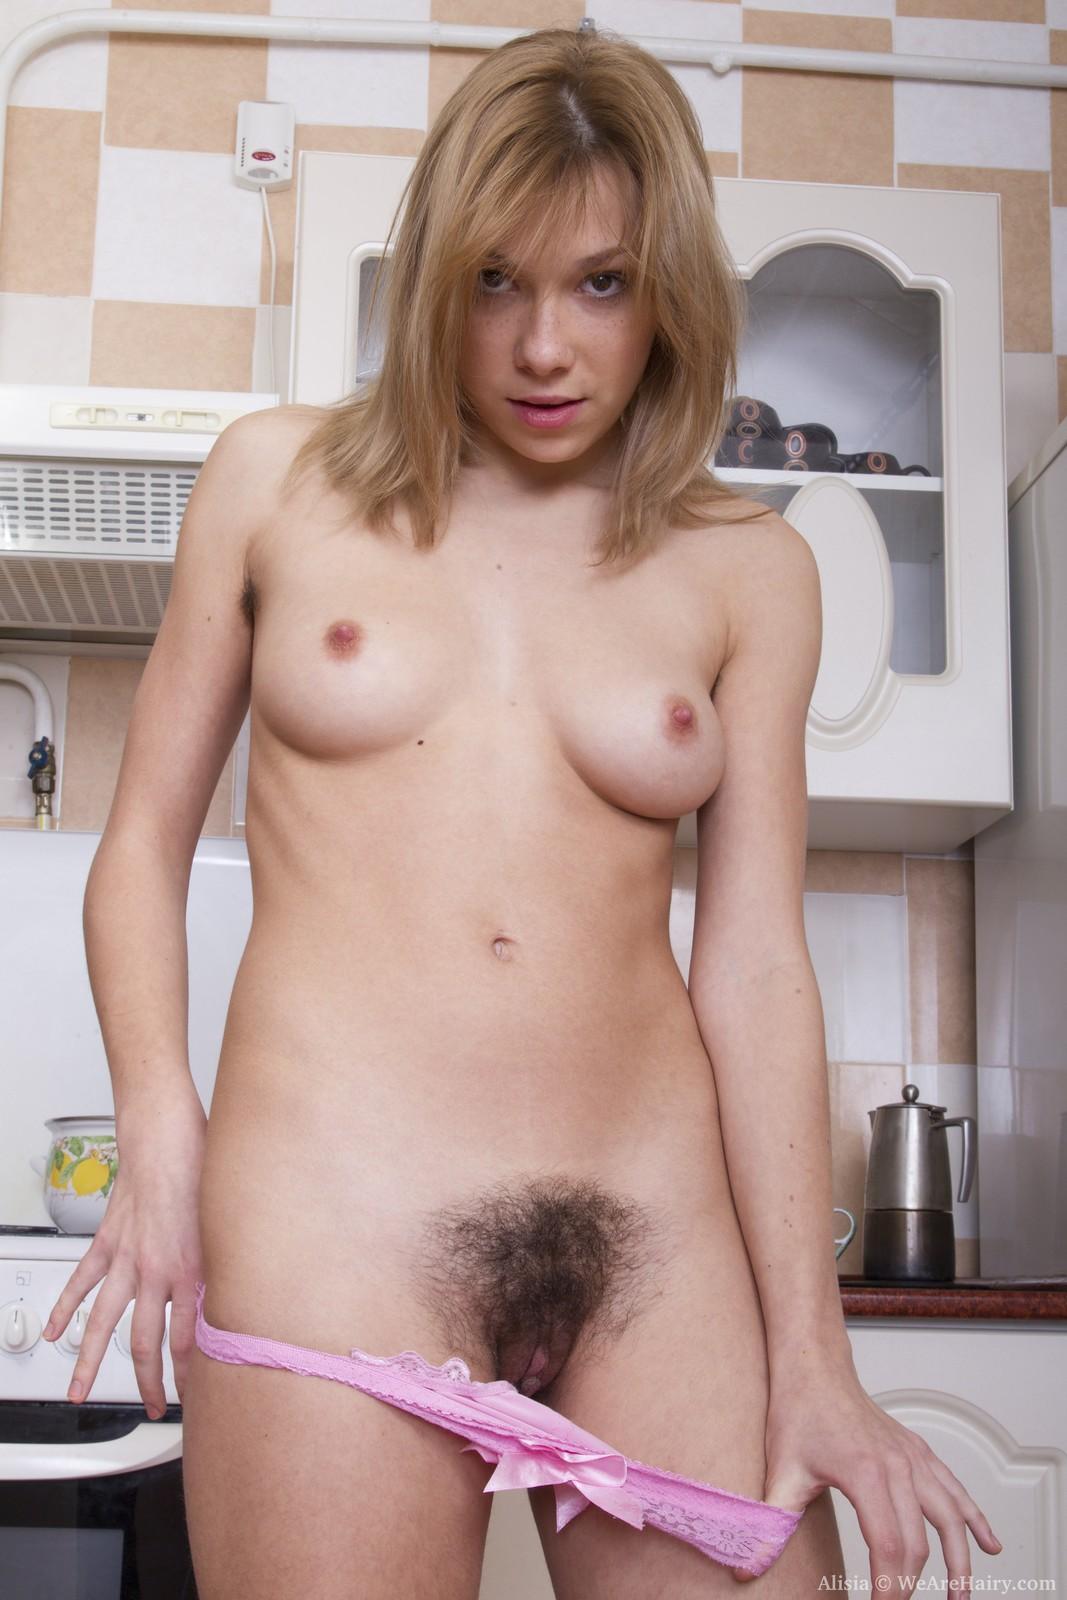 Erotic nude couple photography